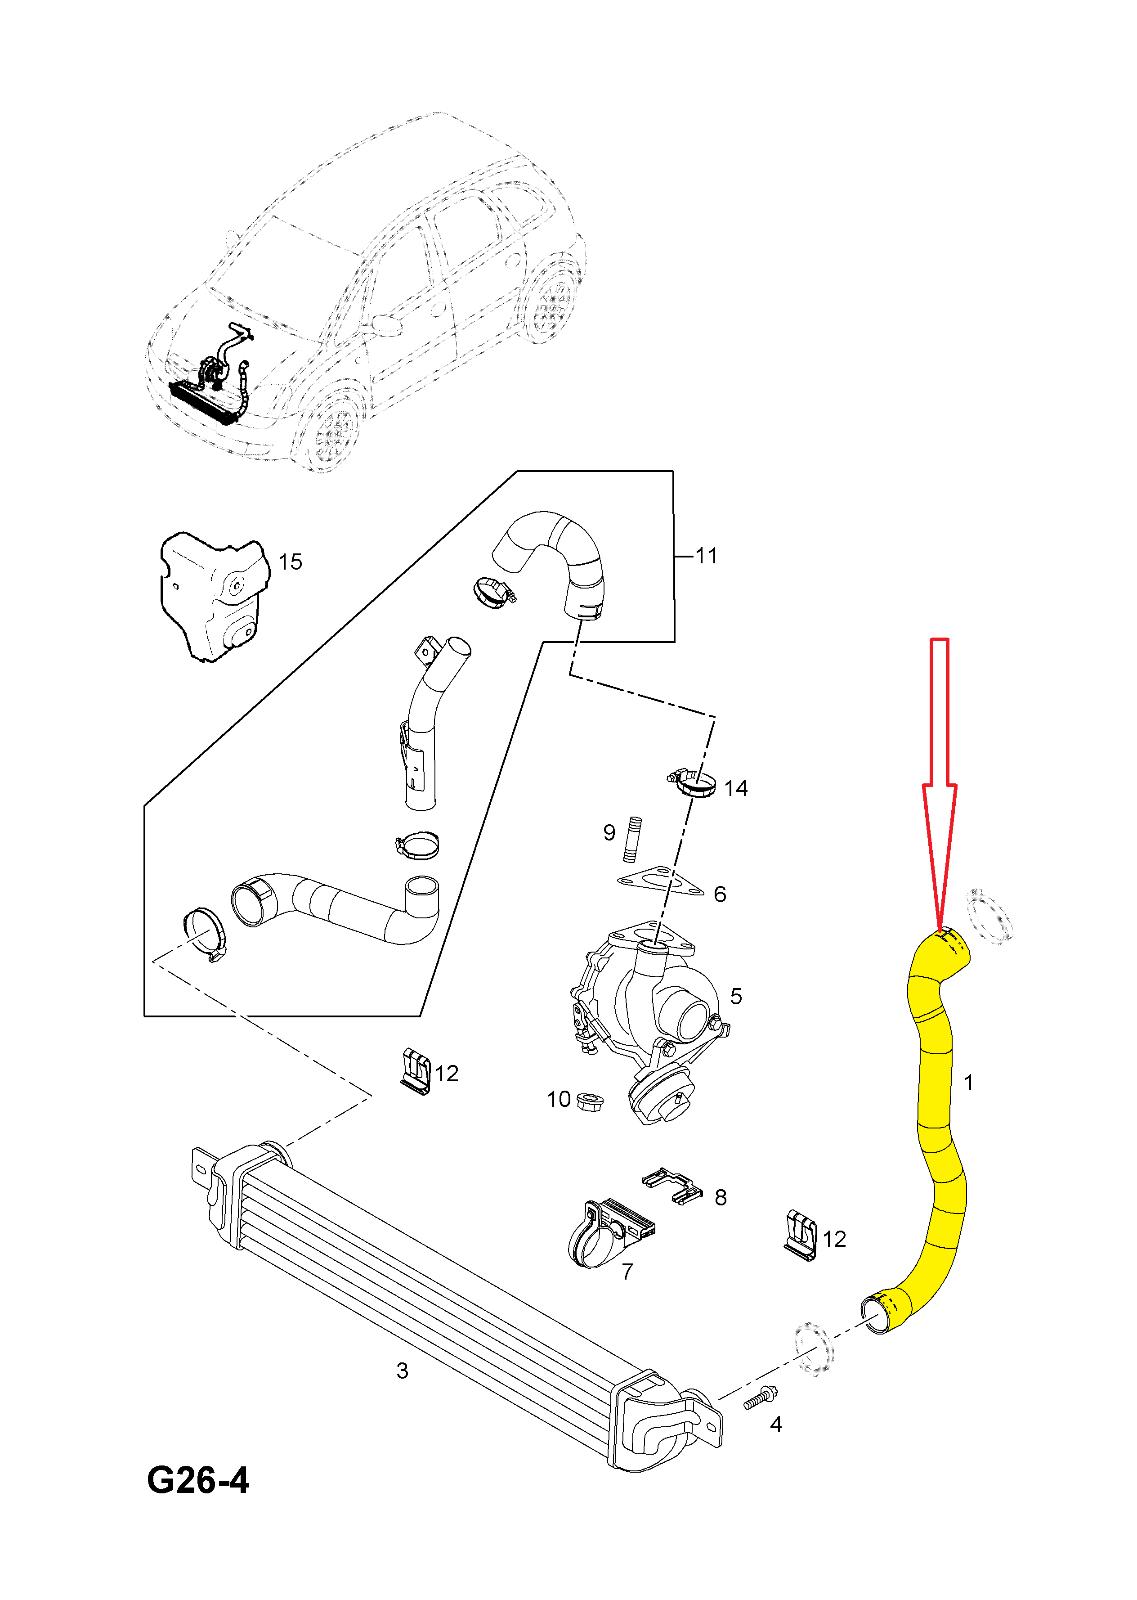 Opel Corsa C 17 Dti Schaltplan